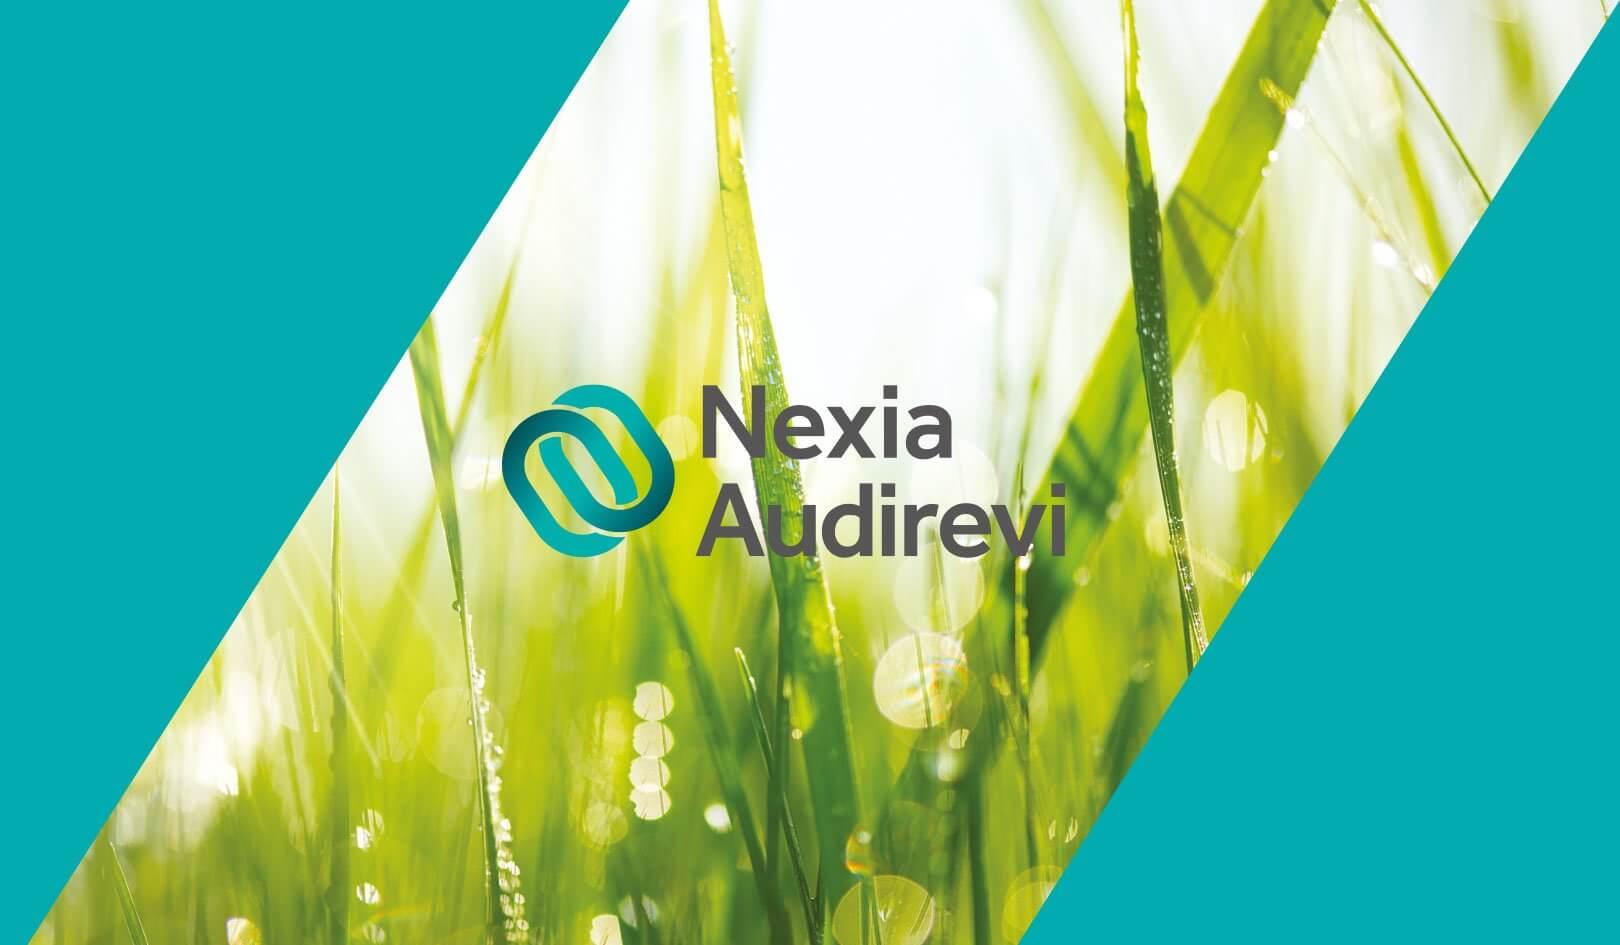 Immagine istituzionale Nexia Audirevi